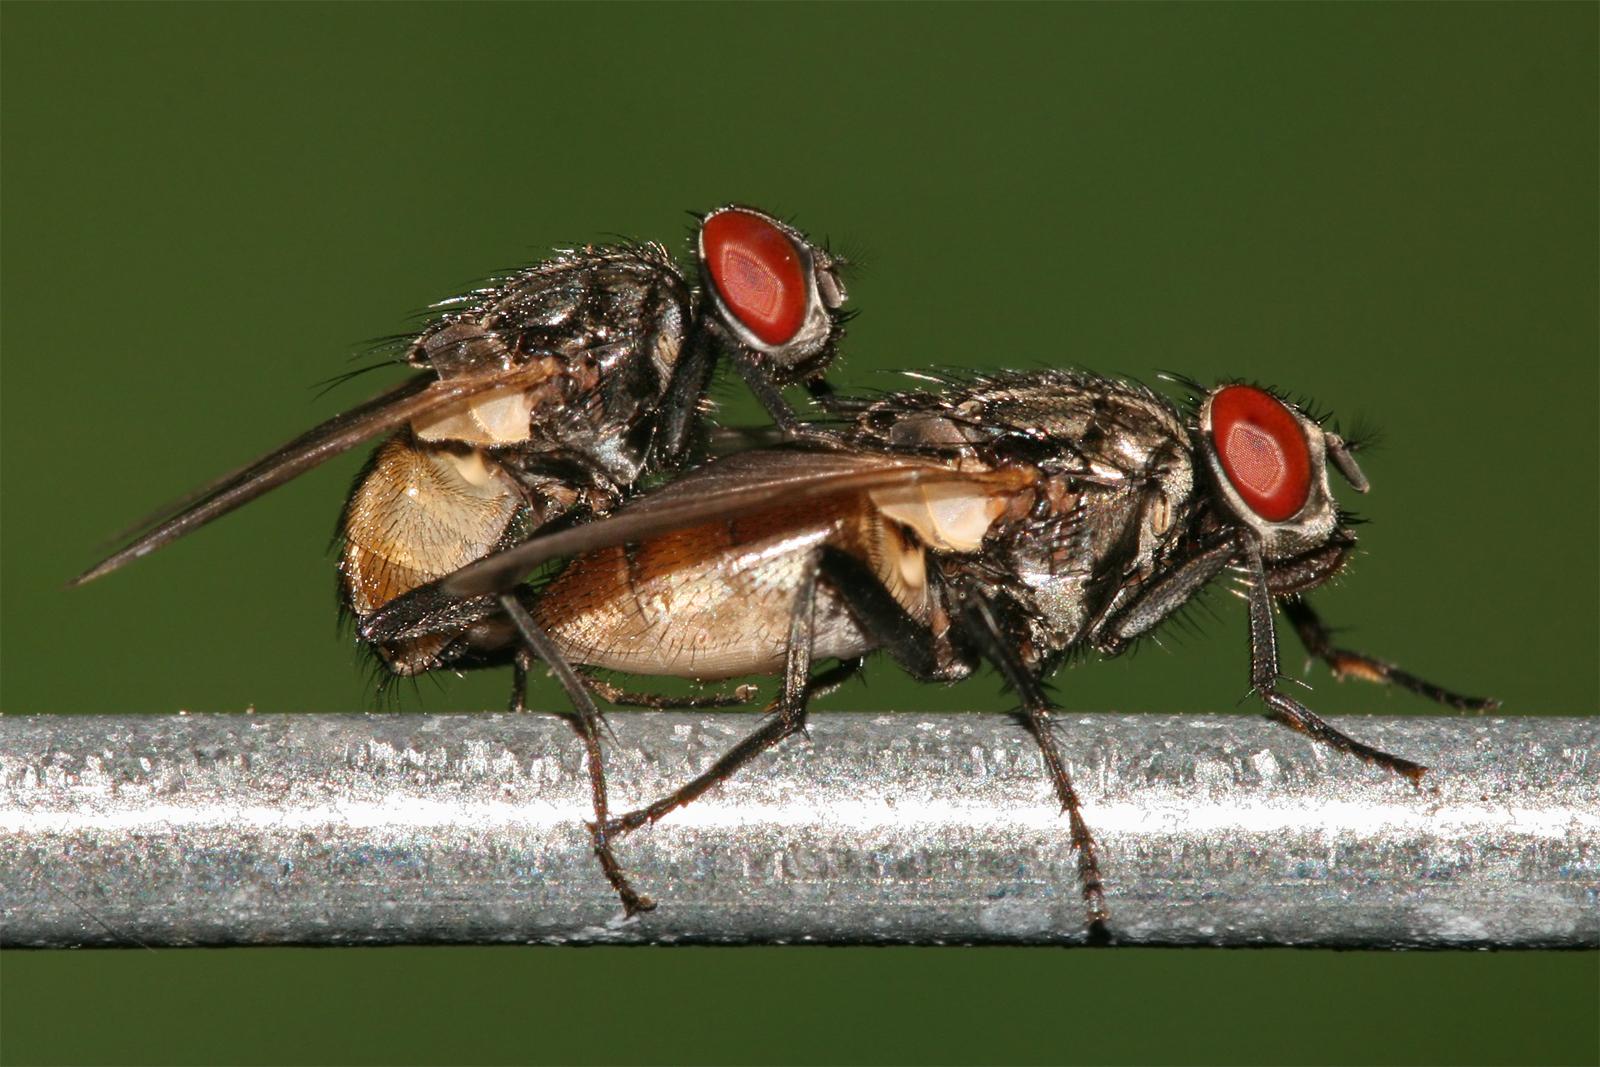 Thụ tinh trong ở ruồi